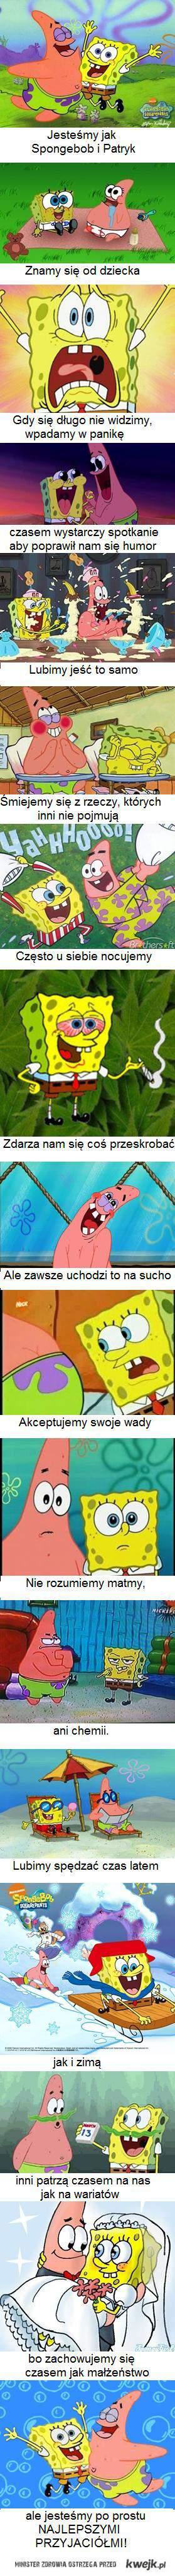 Spongebob i Patryk